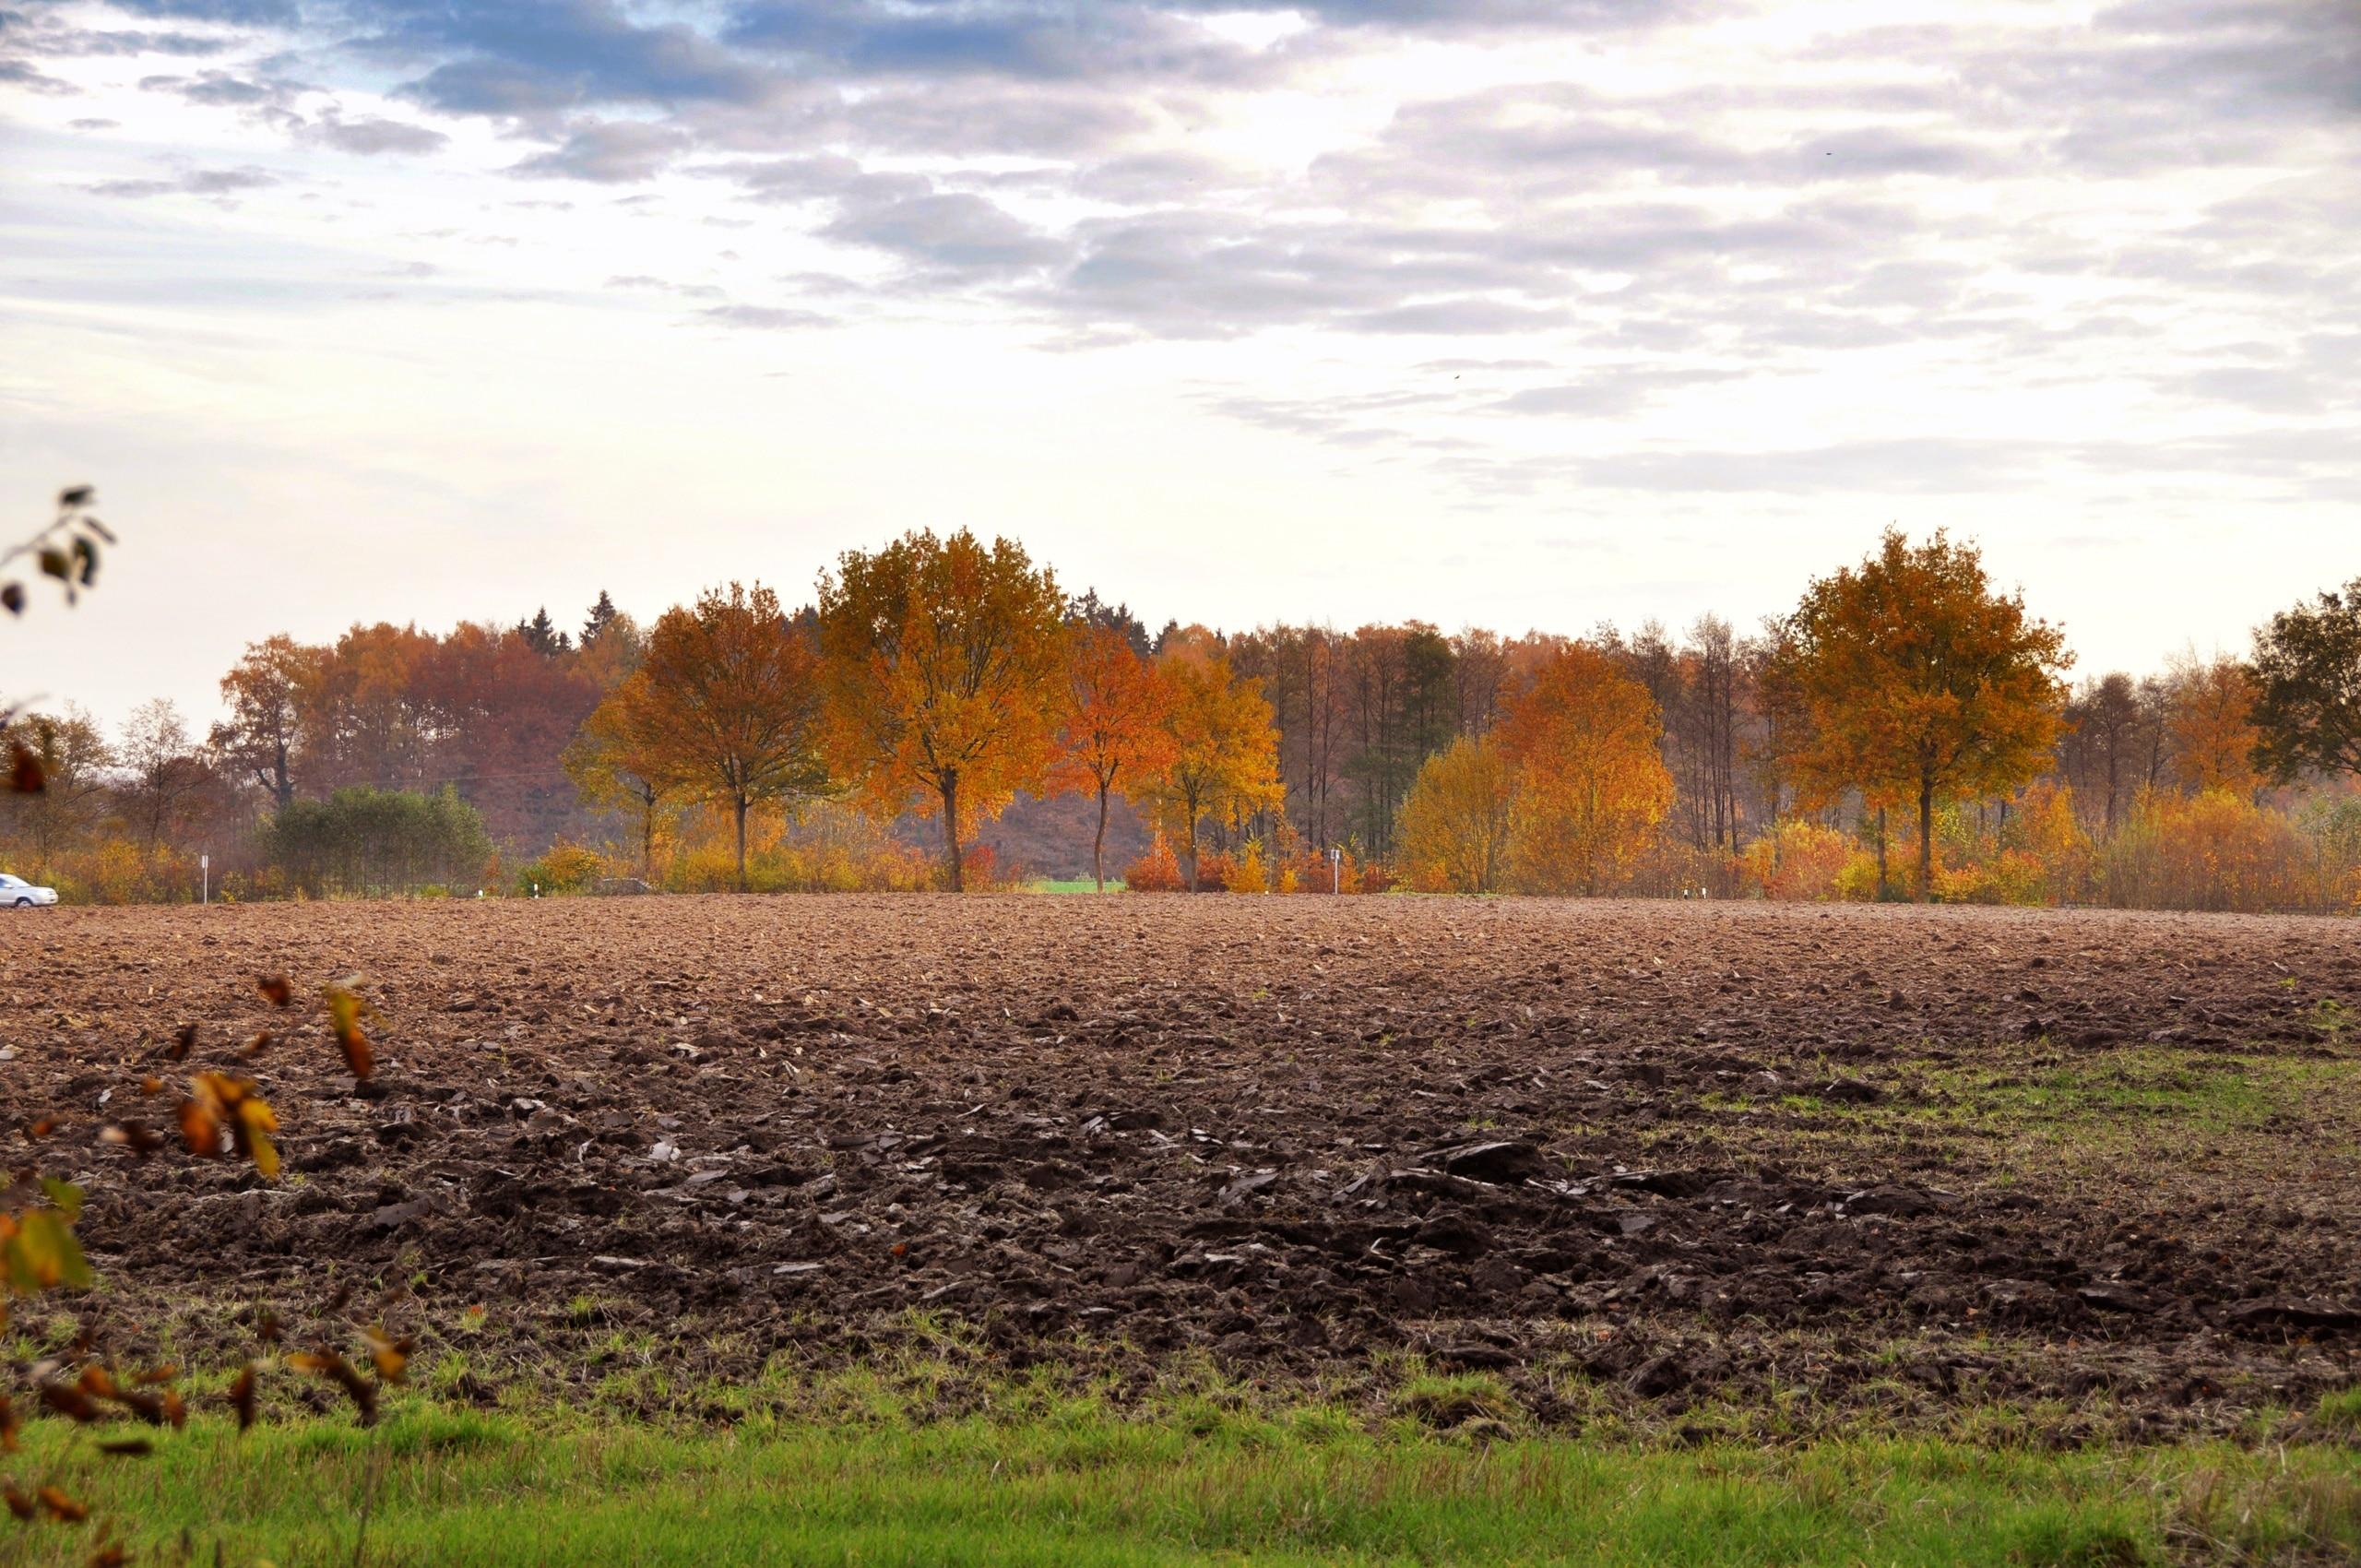 Bliestorf, Schleswig-Holstein, Germany